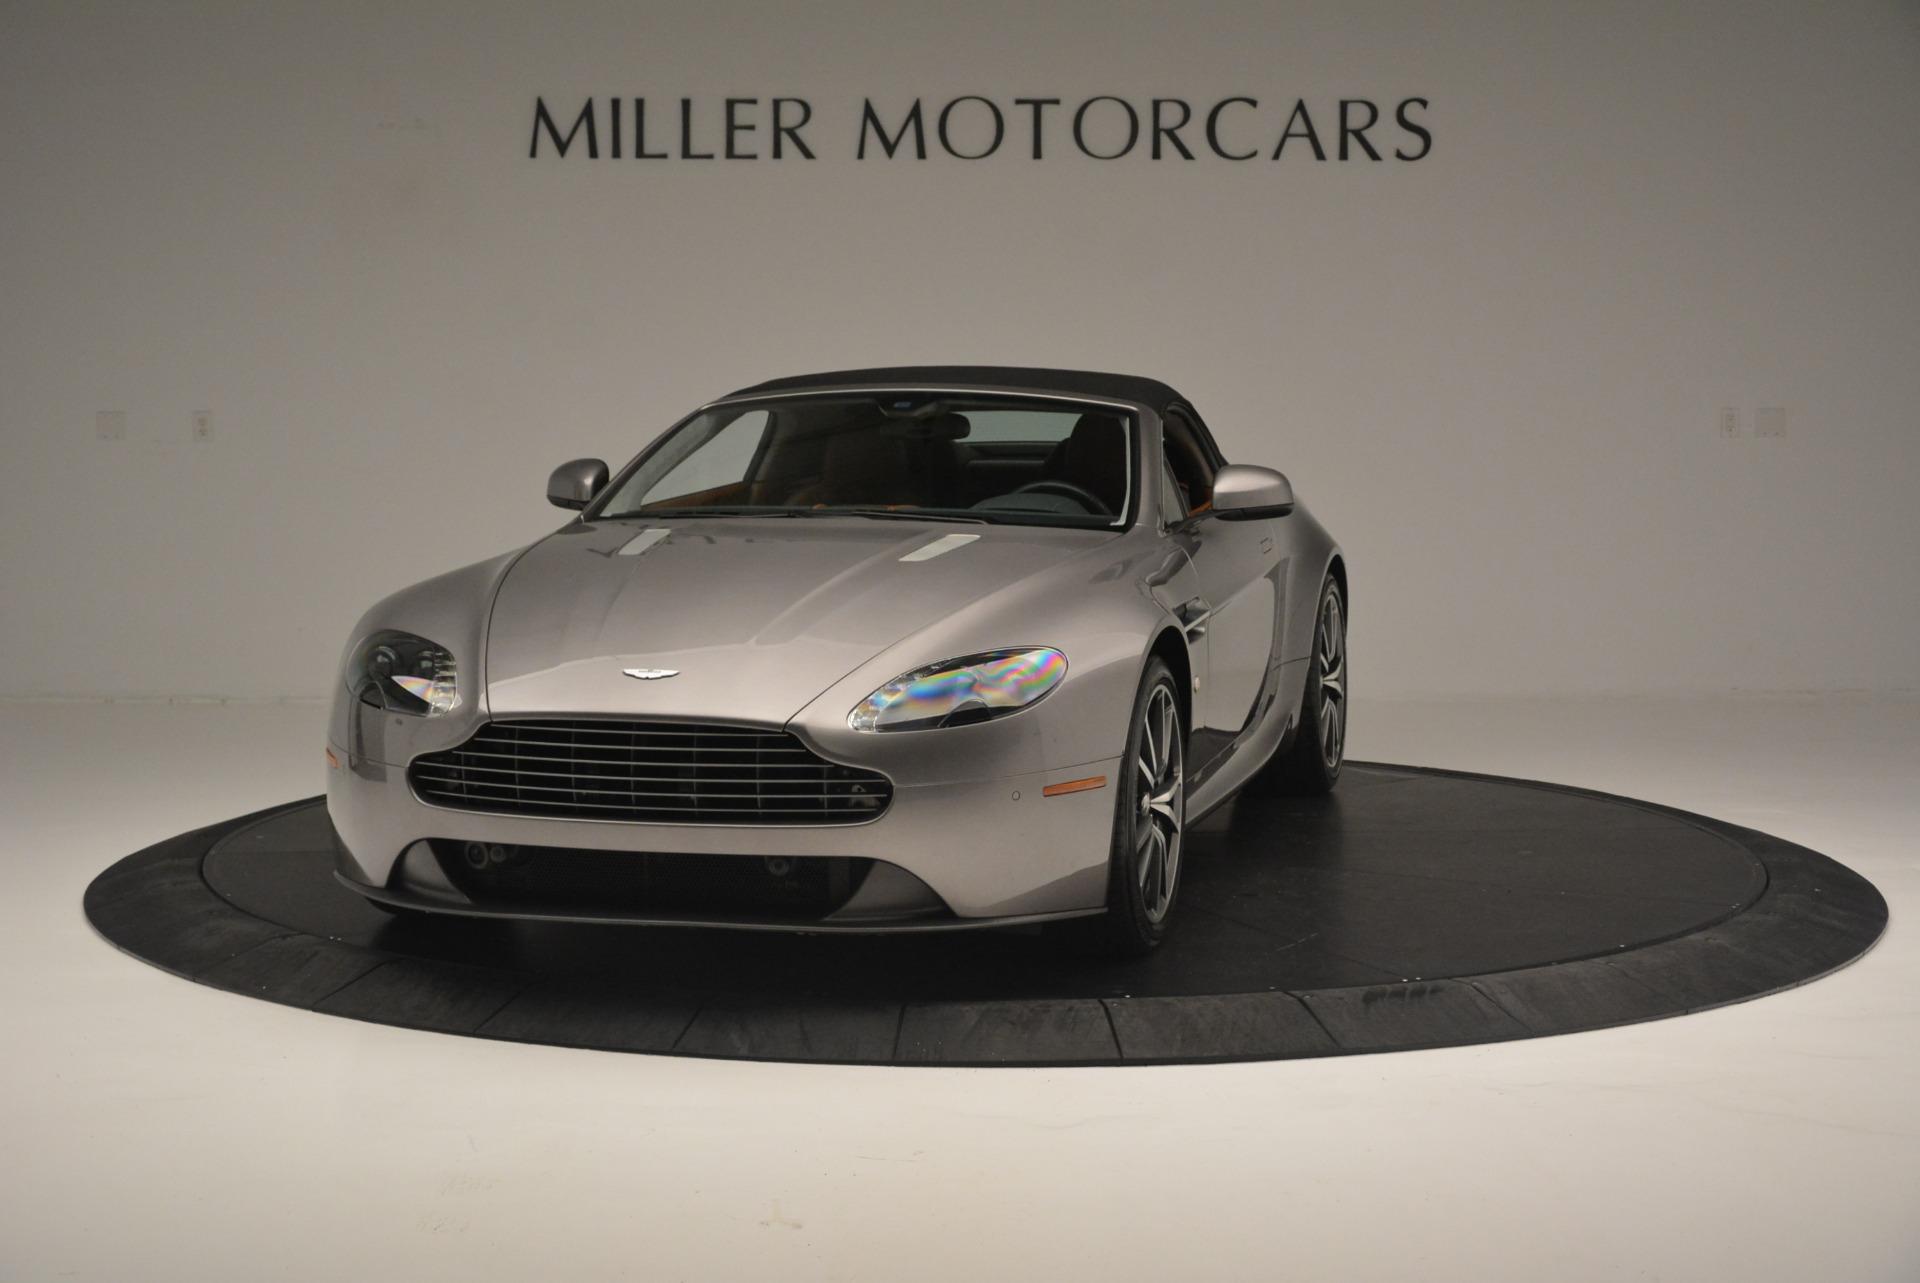 Used 2015 Aston Martin V8 Vantage Roadster For Sale In Greenwich, CT. Alfa Romeo of Greenwich, 7396 2463_p13